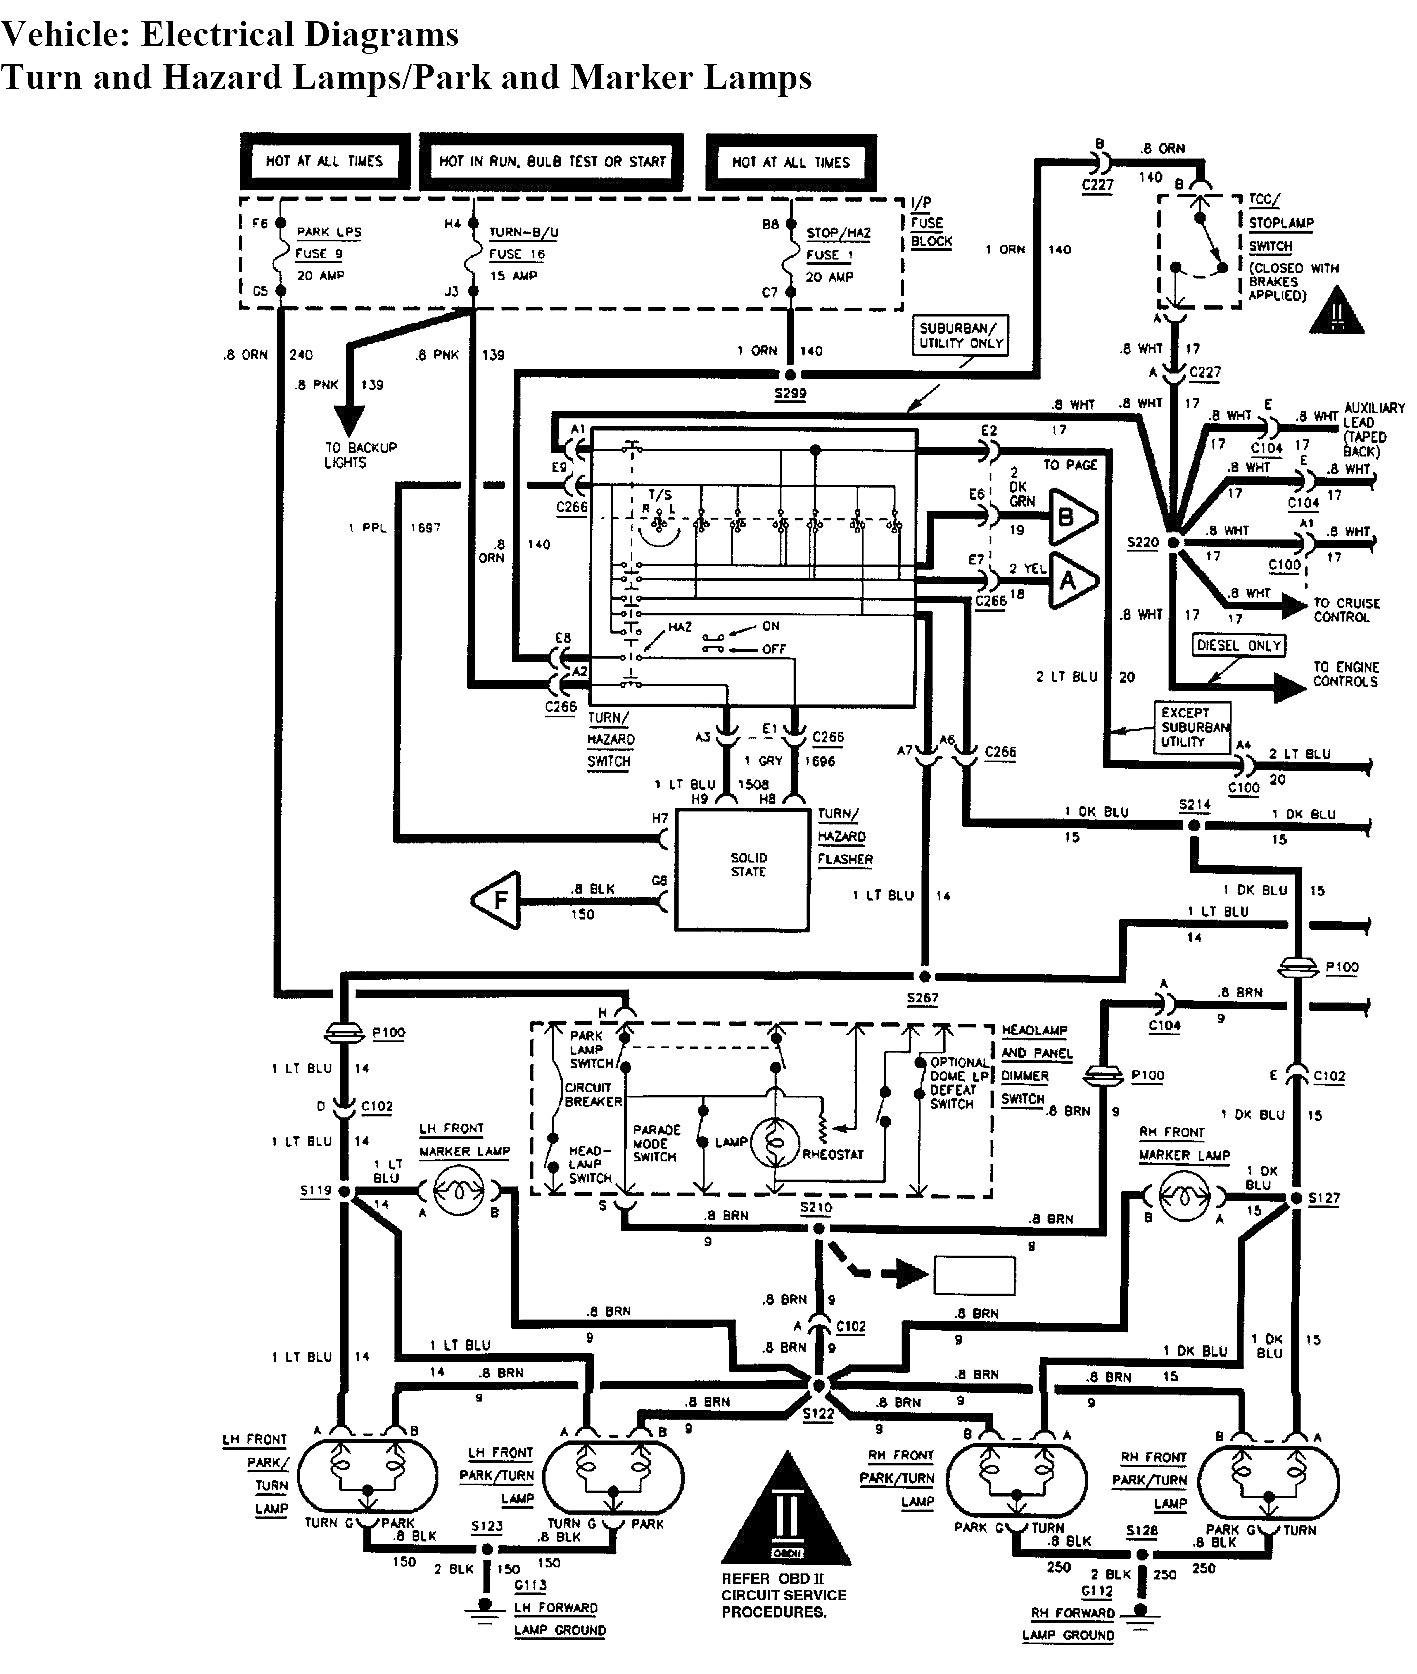 Tail Light Wiring Diagram 1994 Chevy Truck - Wiring Diagram